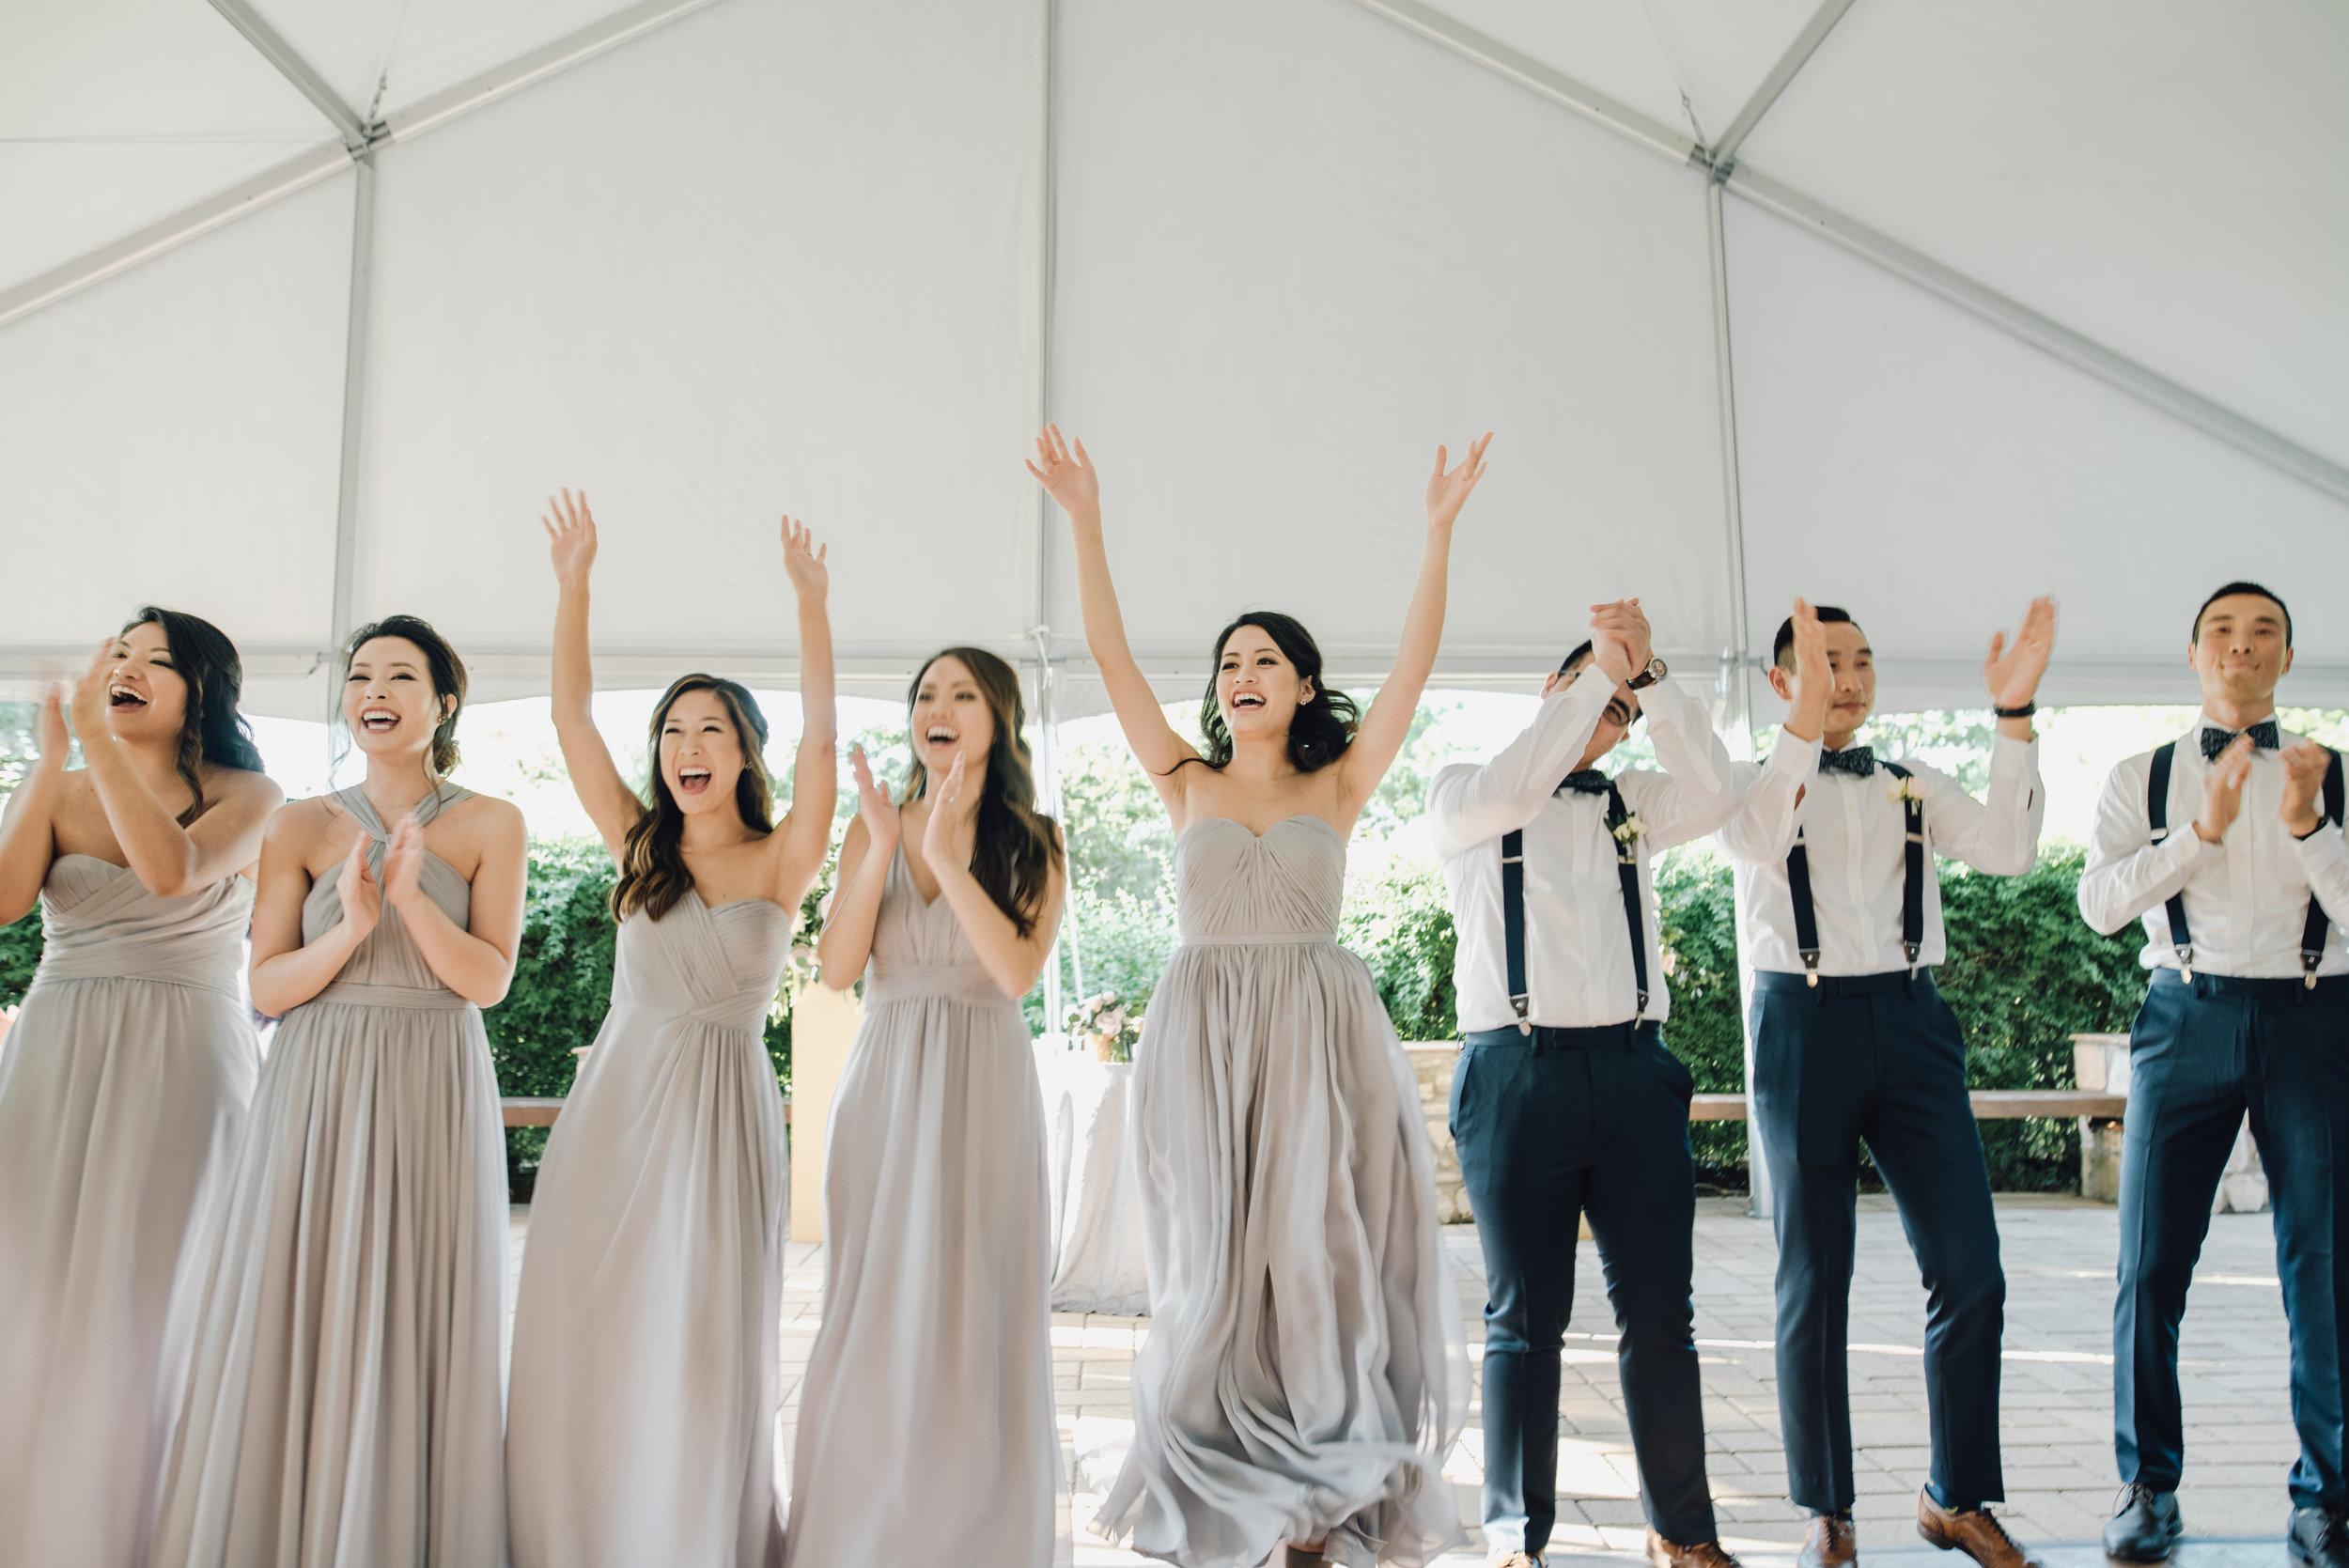 Main and Simple Photography_2018_Weddings_Austin_B+E-1593.jpg